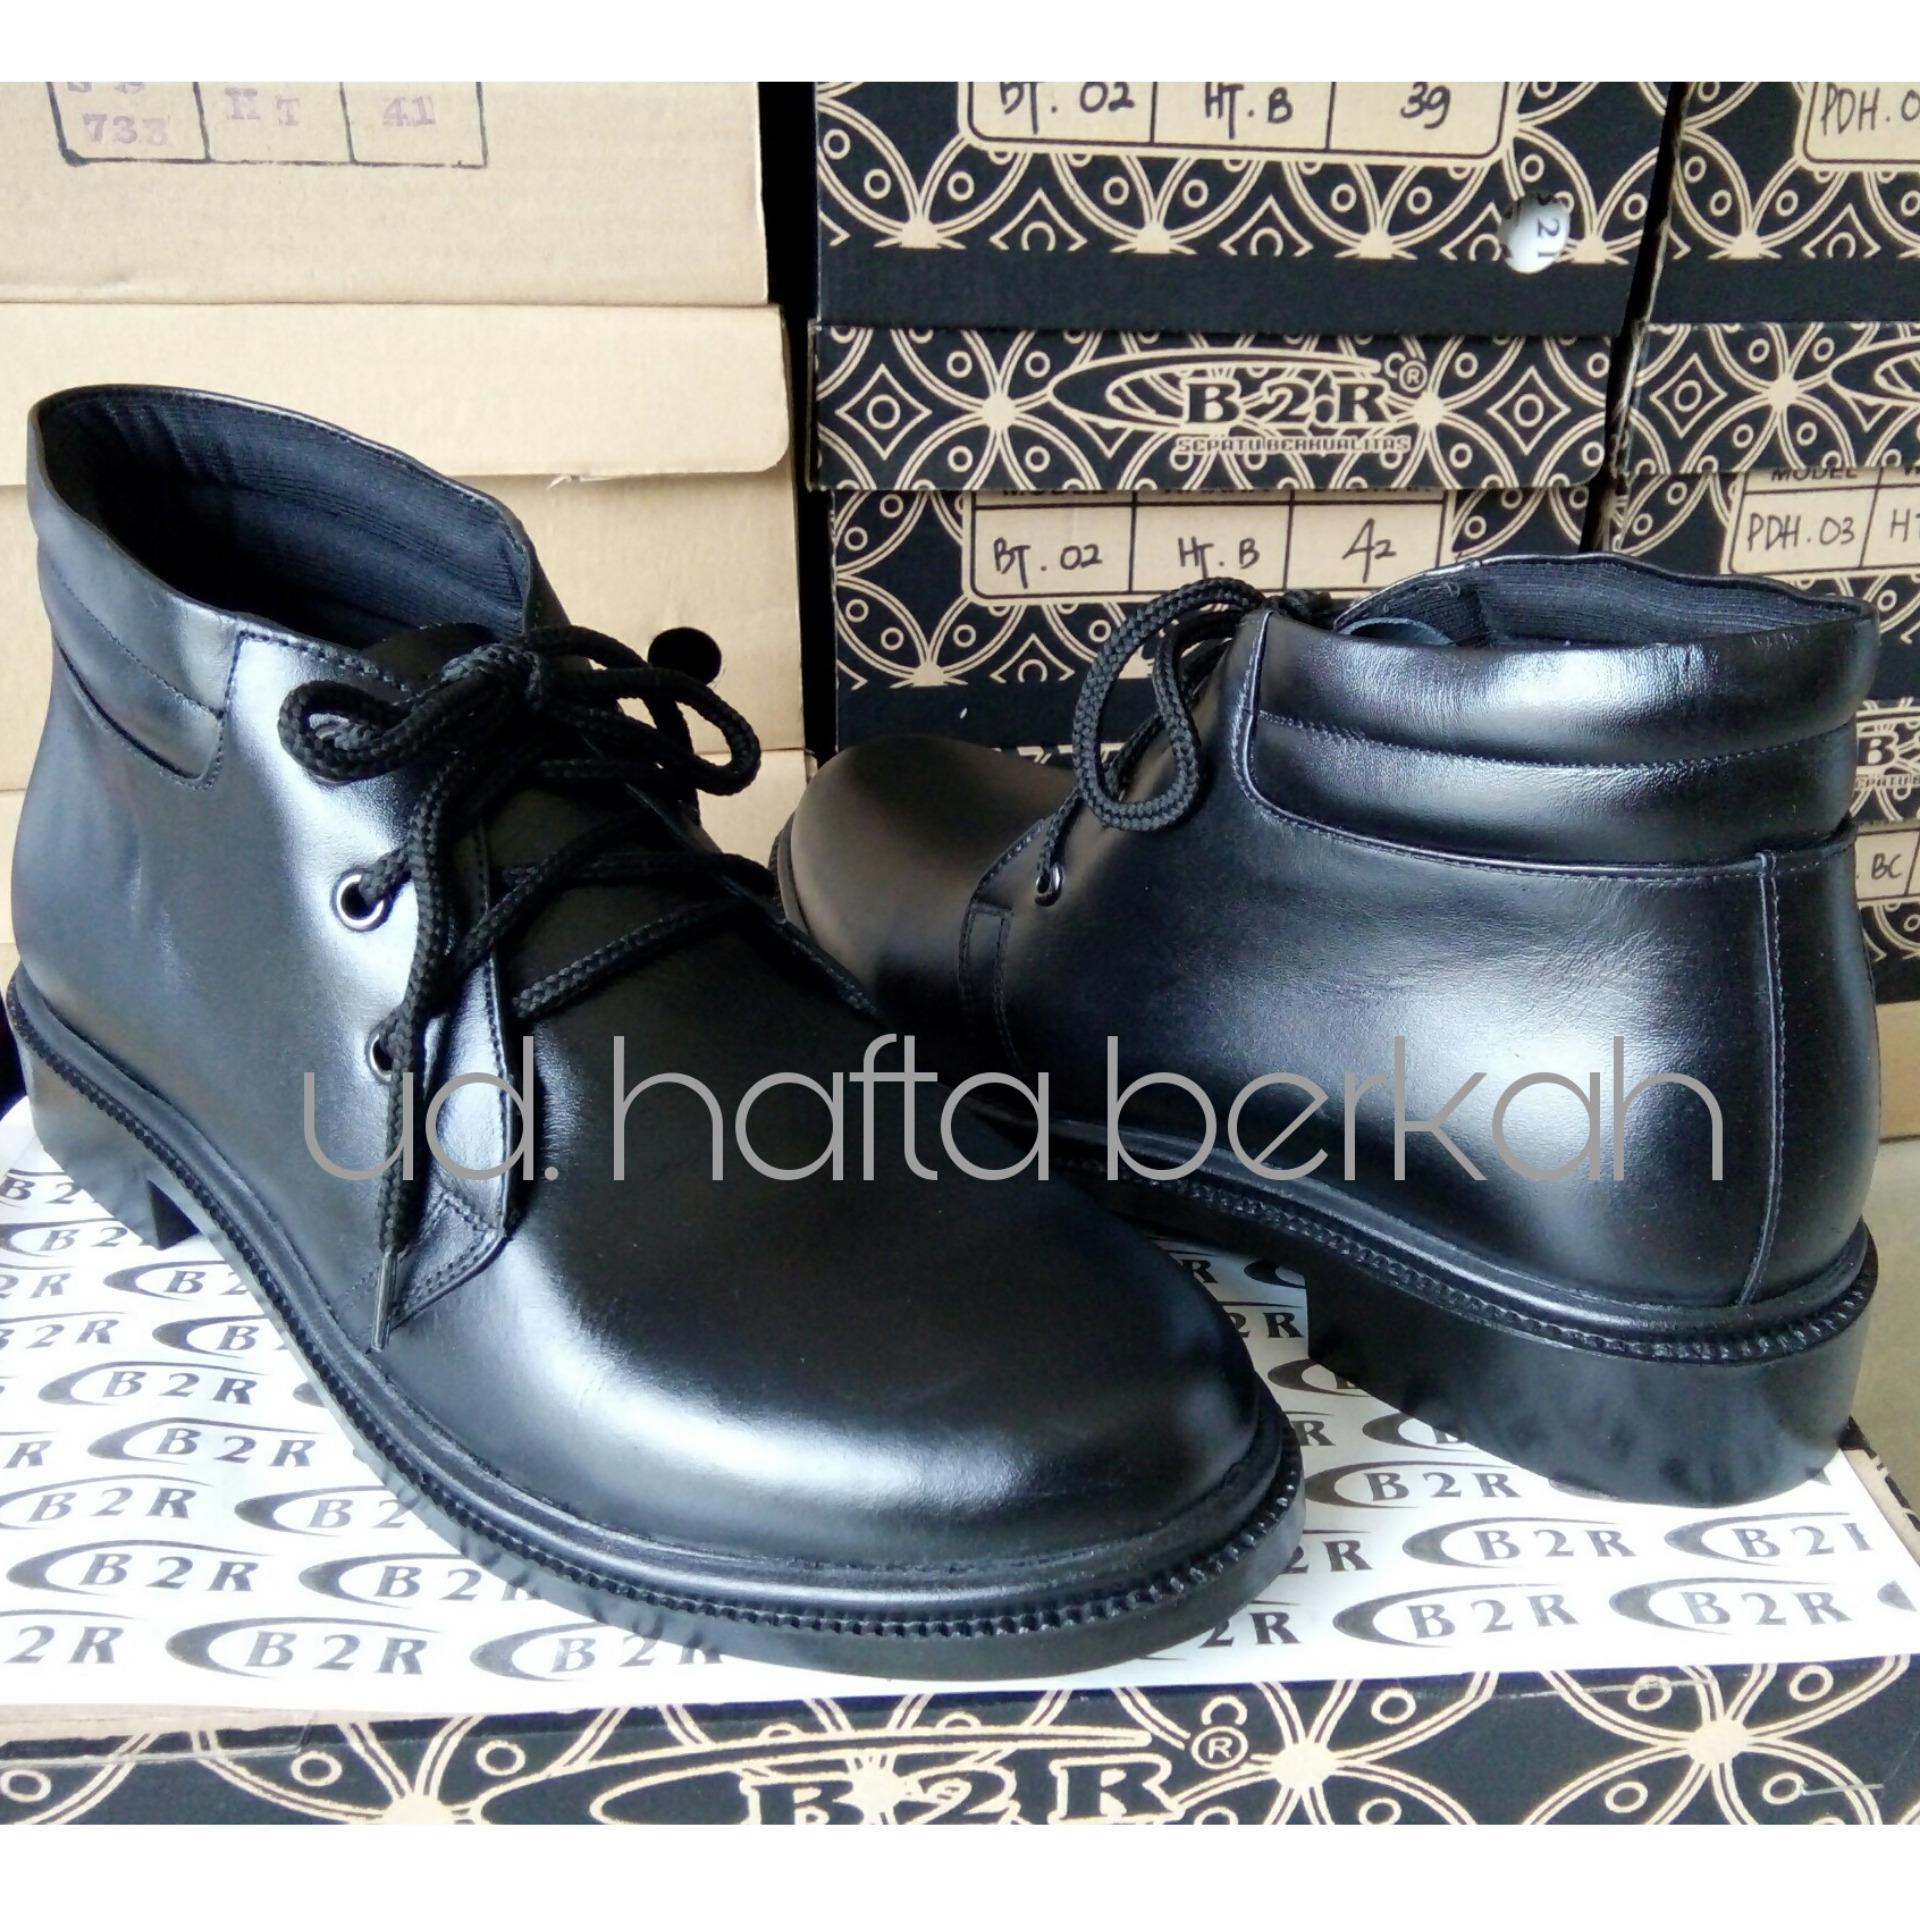 Price Checker Sepatu Pdh Seri Bt 04 Standar Tni Polri Security Pdl Ter Paskibraka Best